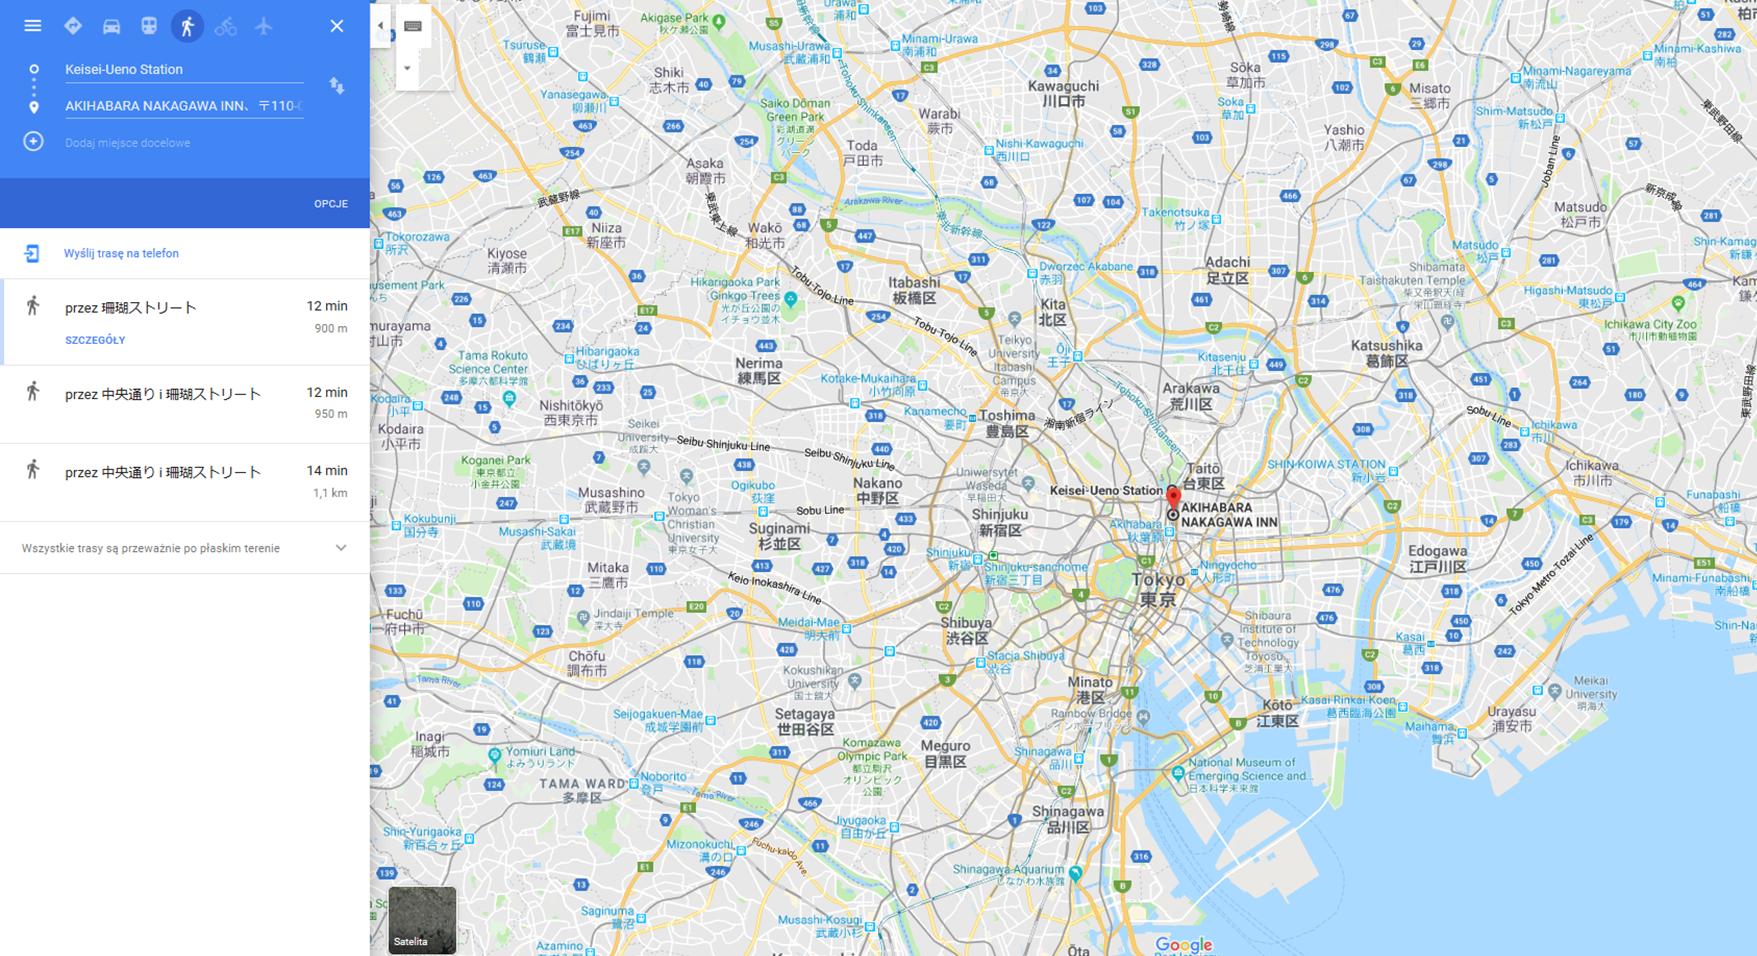 nocleg-w-tokio-mapa